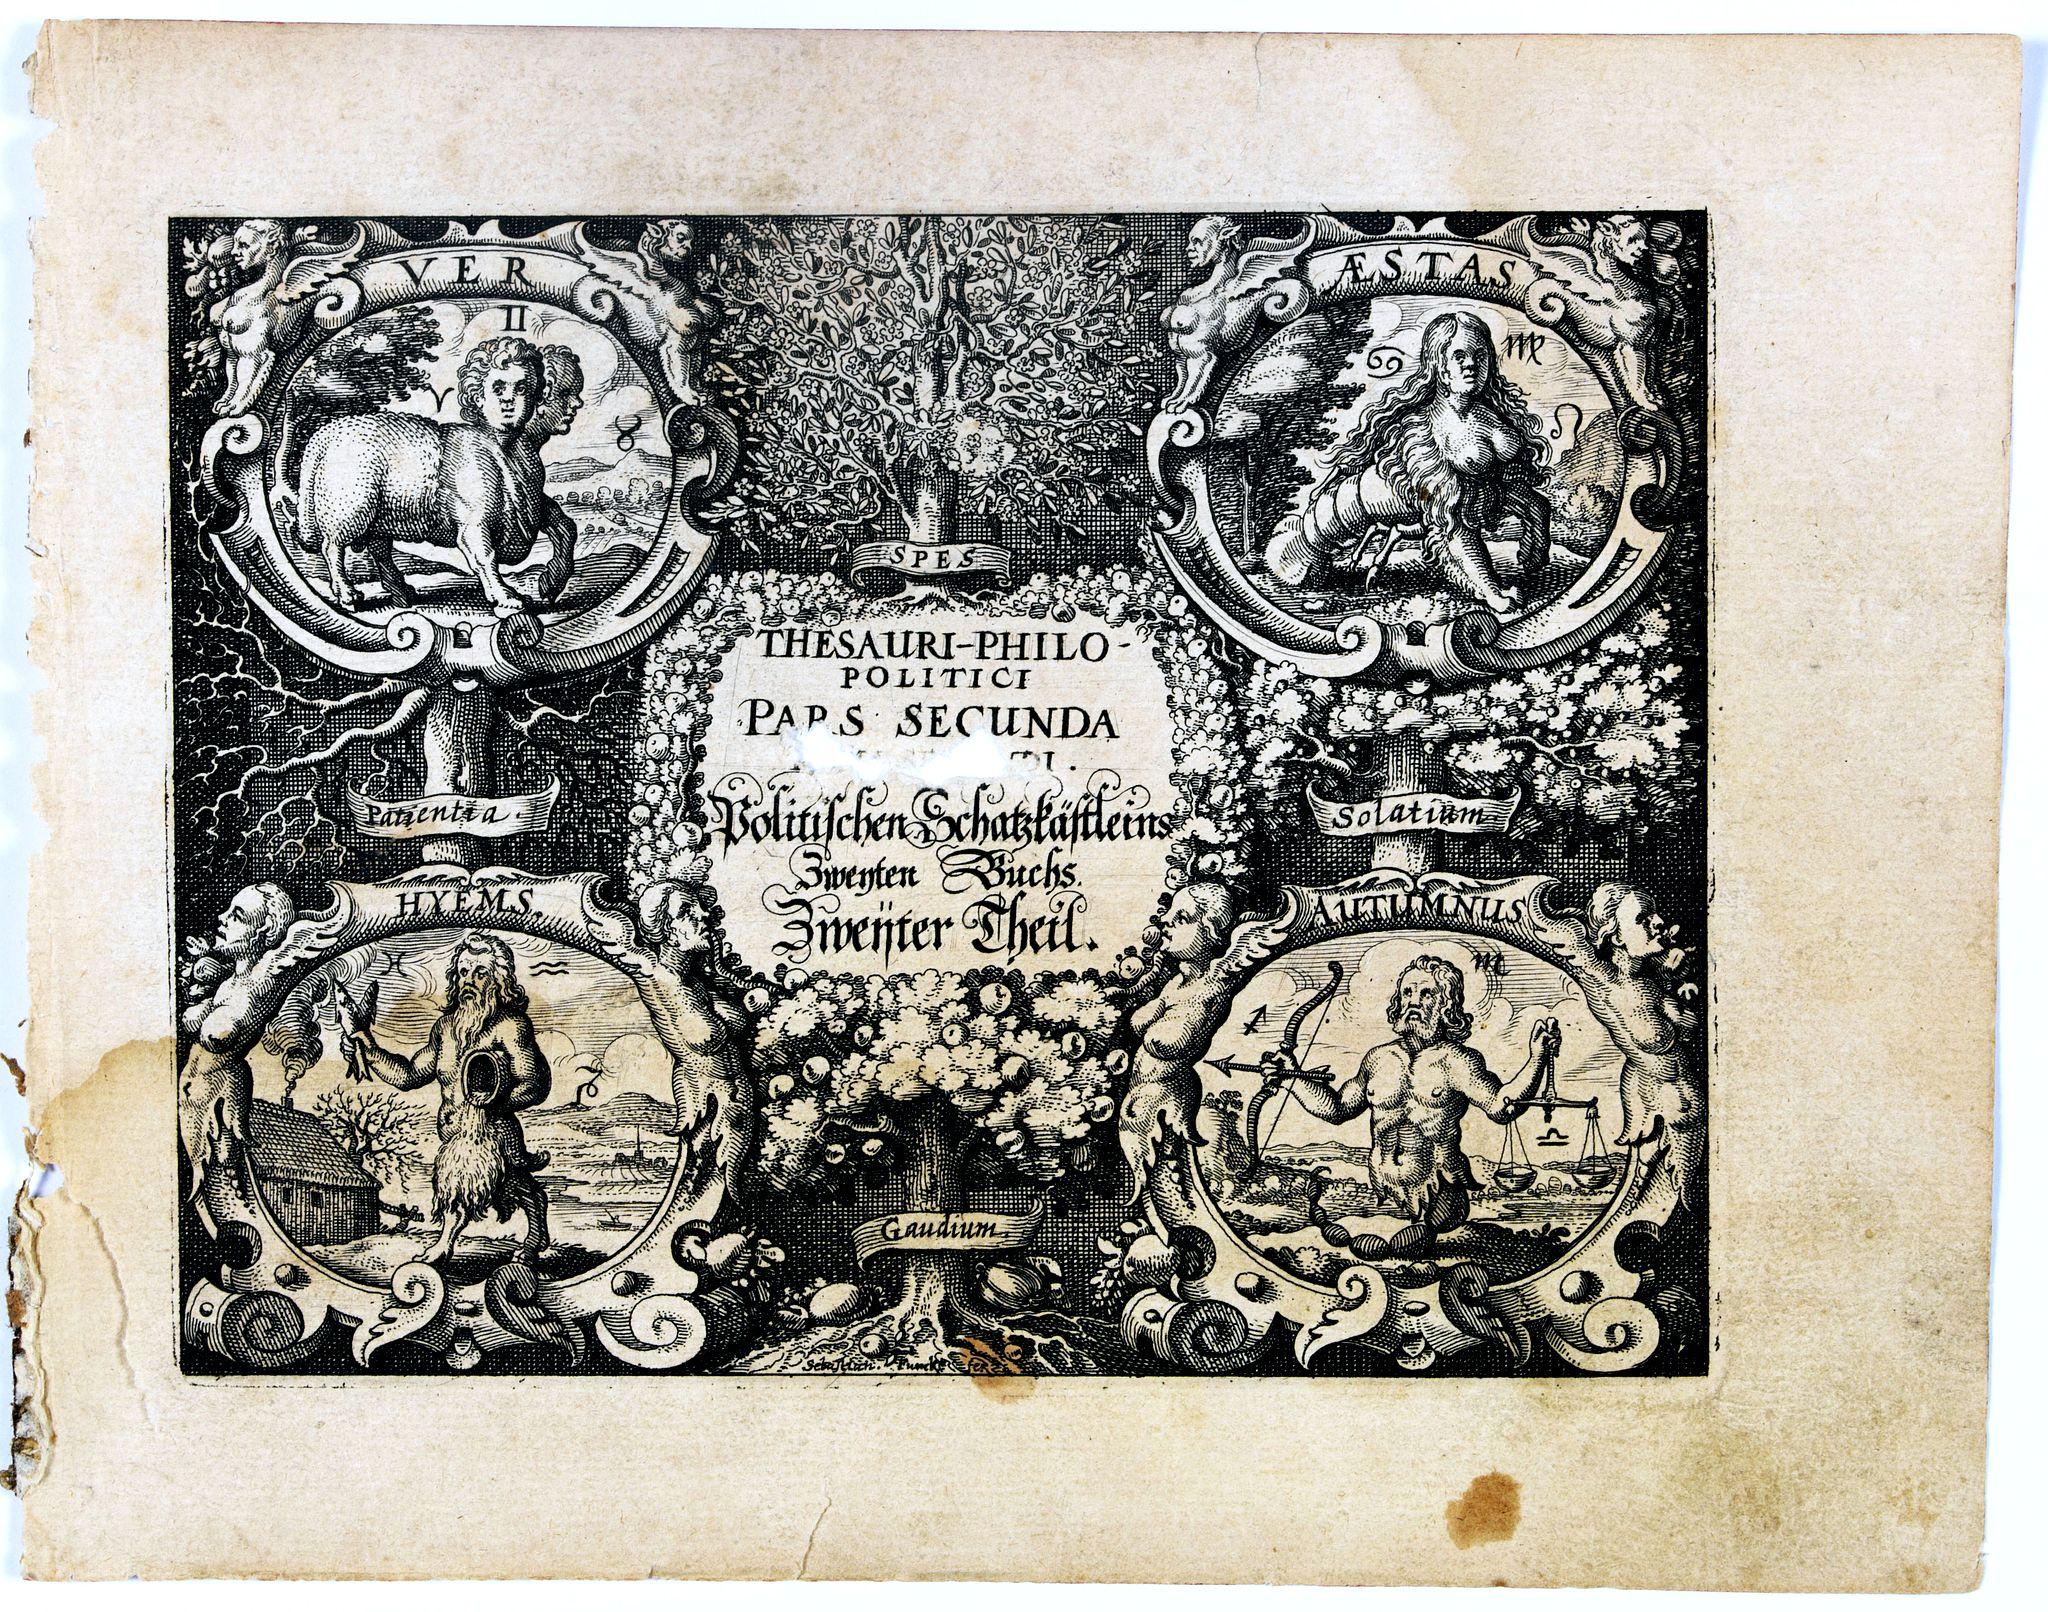 MEISNER, D. -  [Title page] Thesauri Philo-Politci pars Secunda. . .